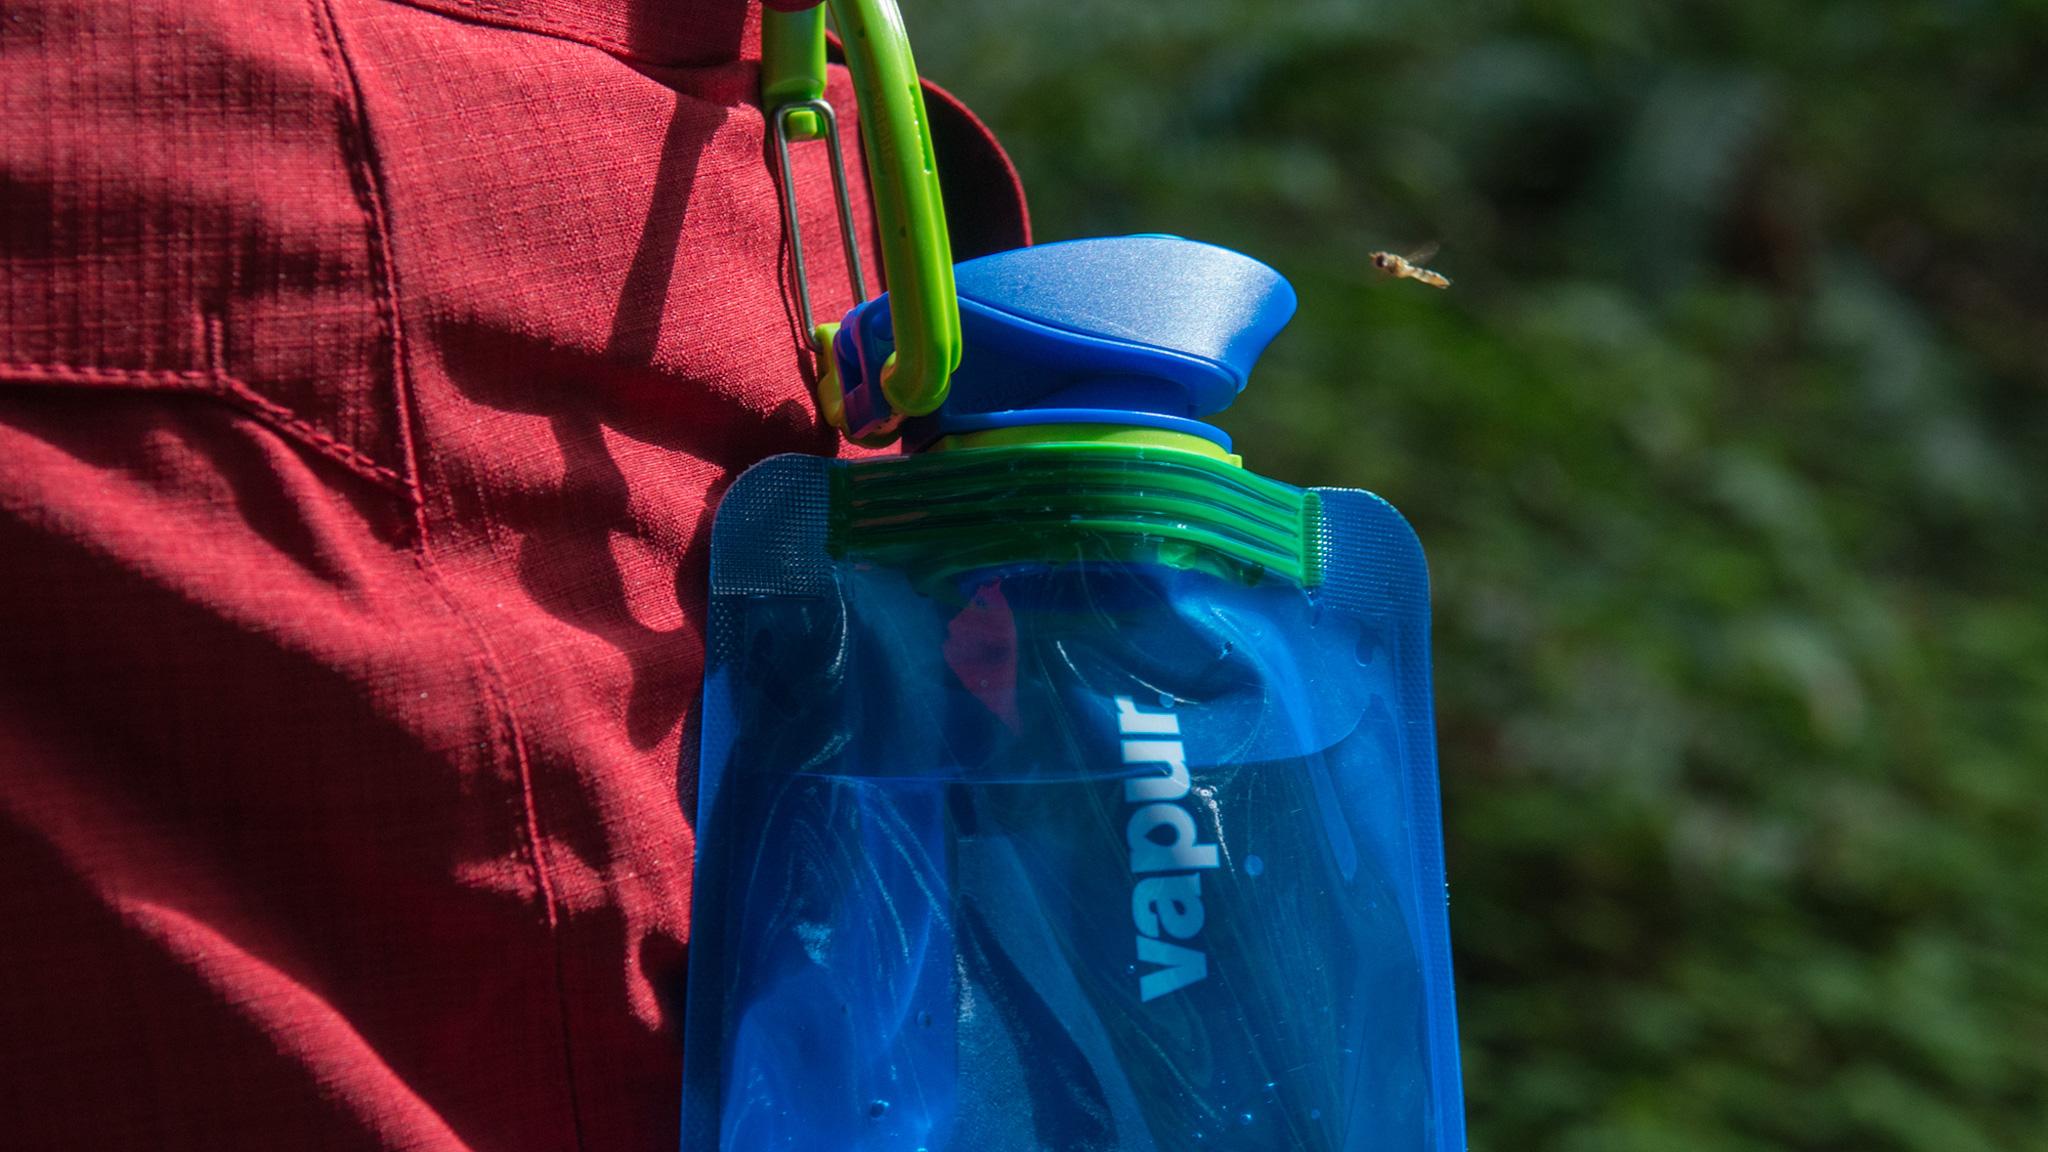 Vapur: Anti-Bottles